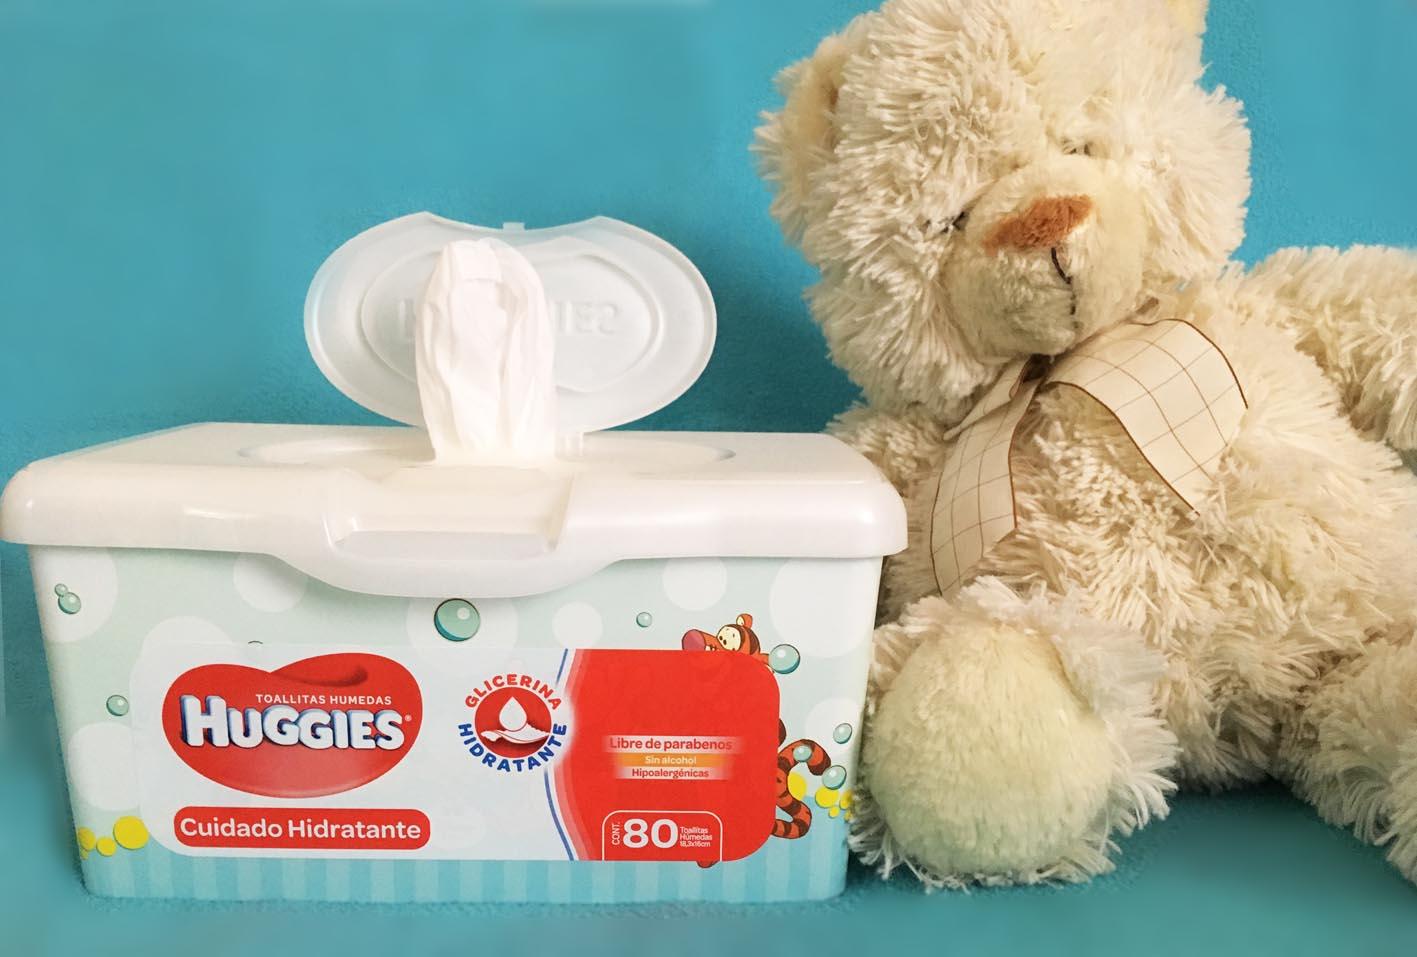 Toallitas Húmedas Huggies® Cuidado Hidratante